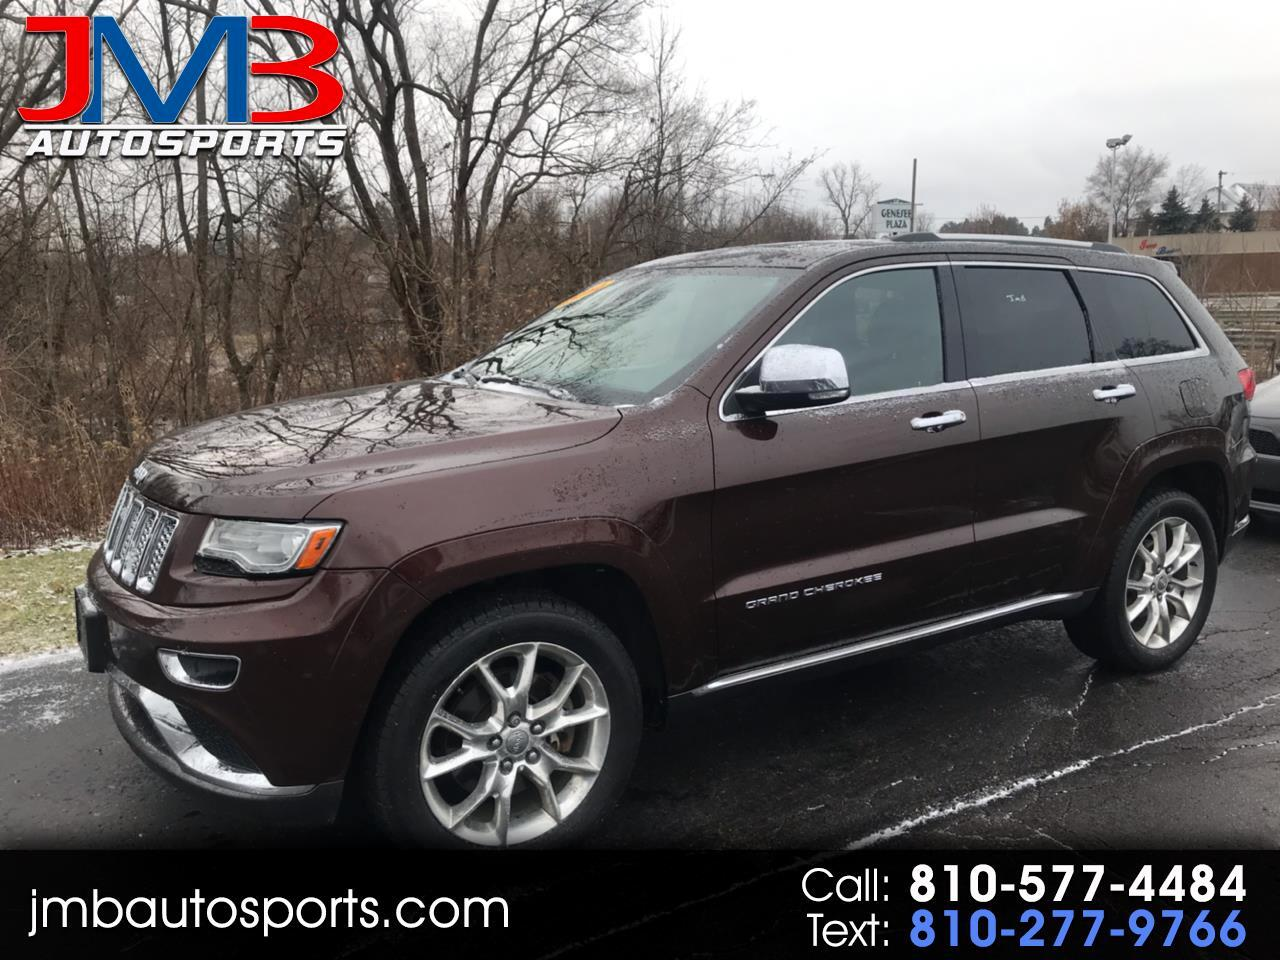 Used Tires Flint Mi >> Used 2014 Jeep Grand Cherokee Summit 4wd For Sale In Flint